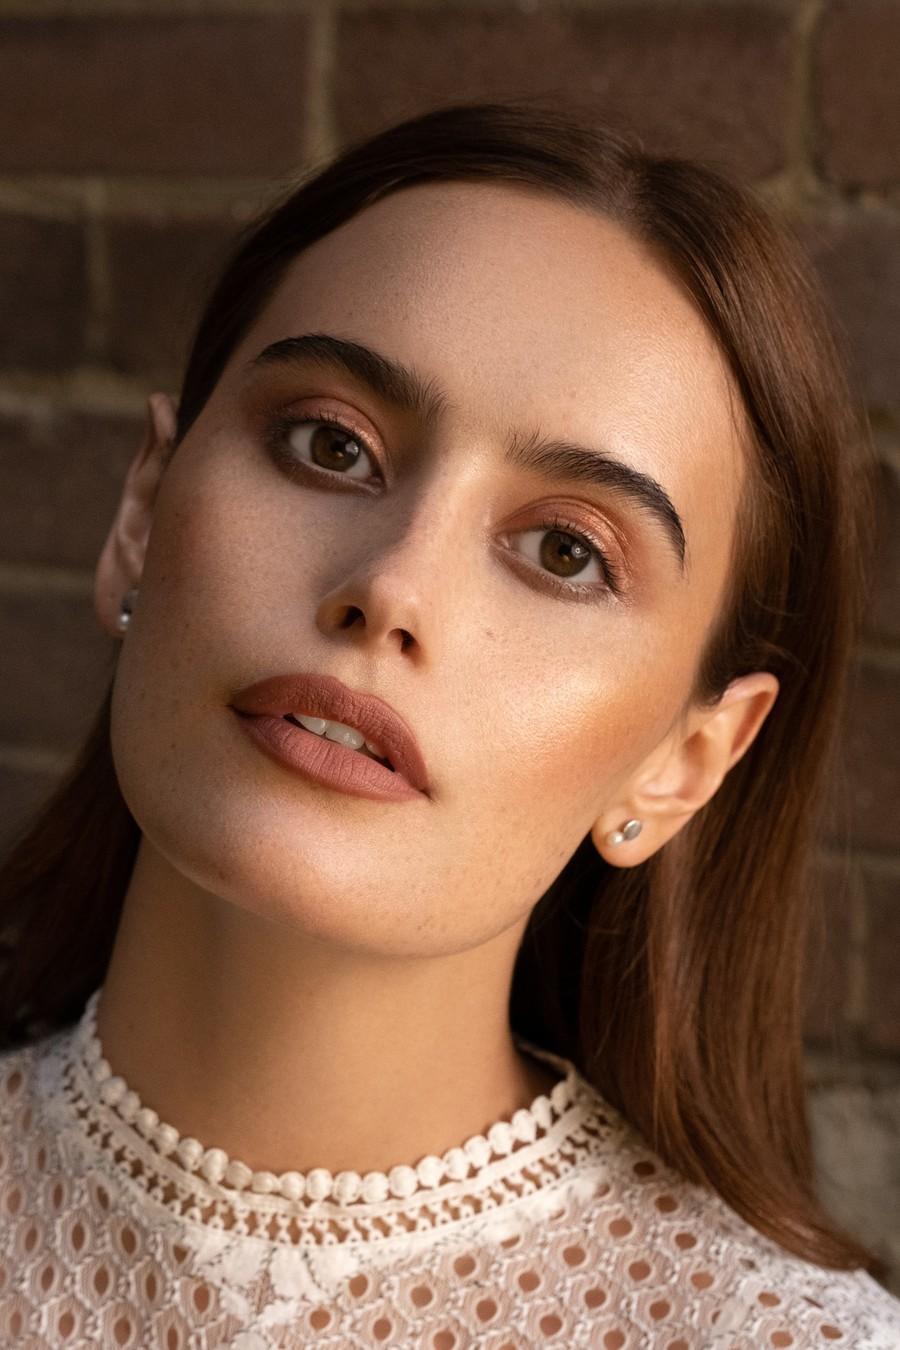 @biancaprietomakeup, Photographer / MUA :) / Model EmilyM / Uploaded 10th August 2019 @ 12:45 PM